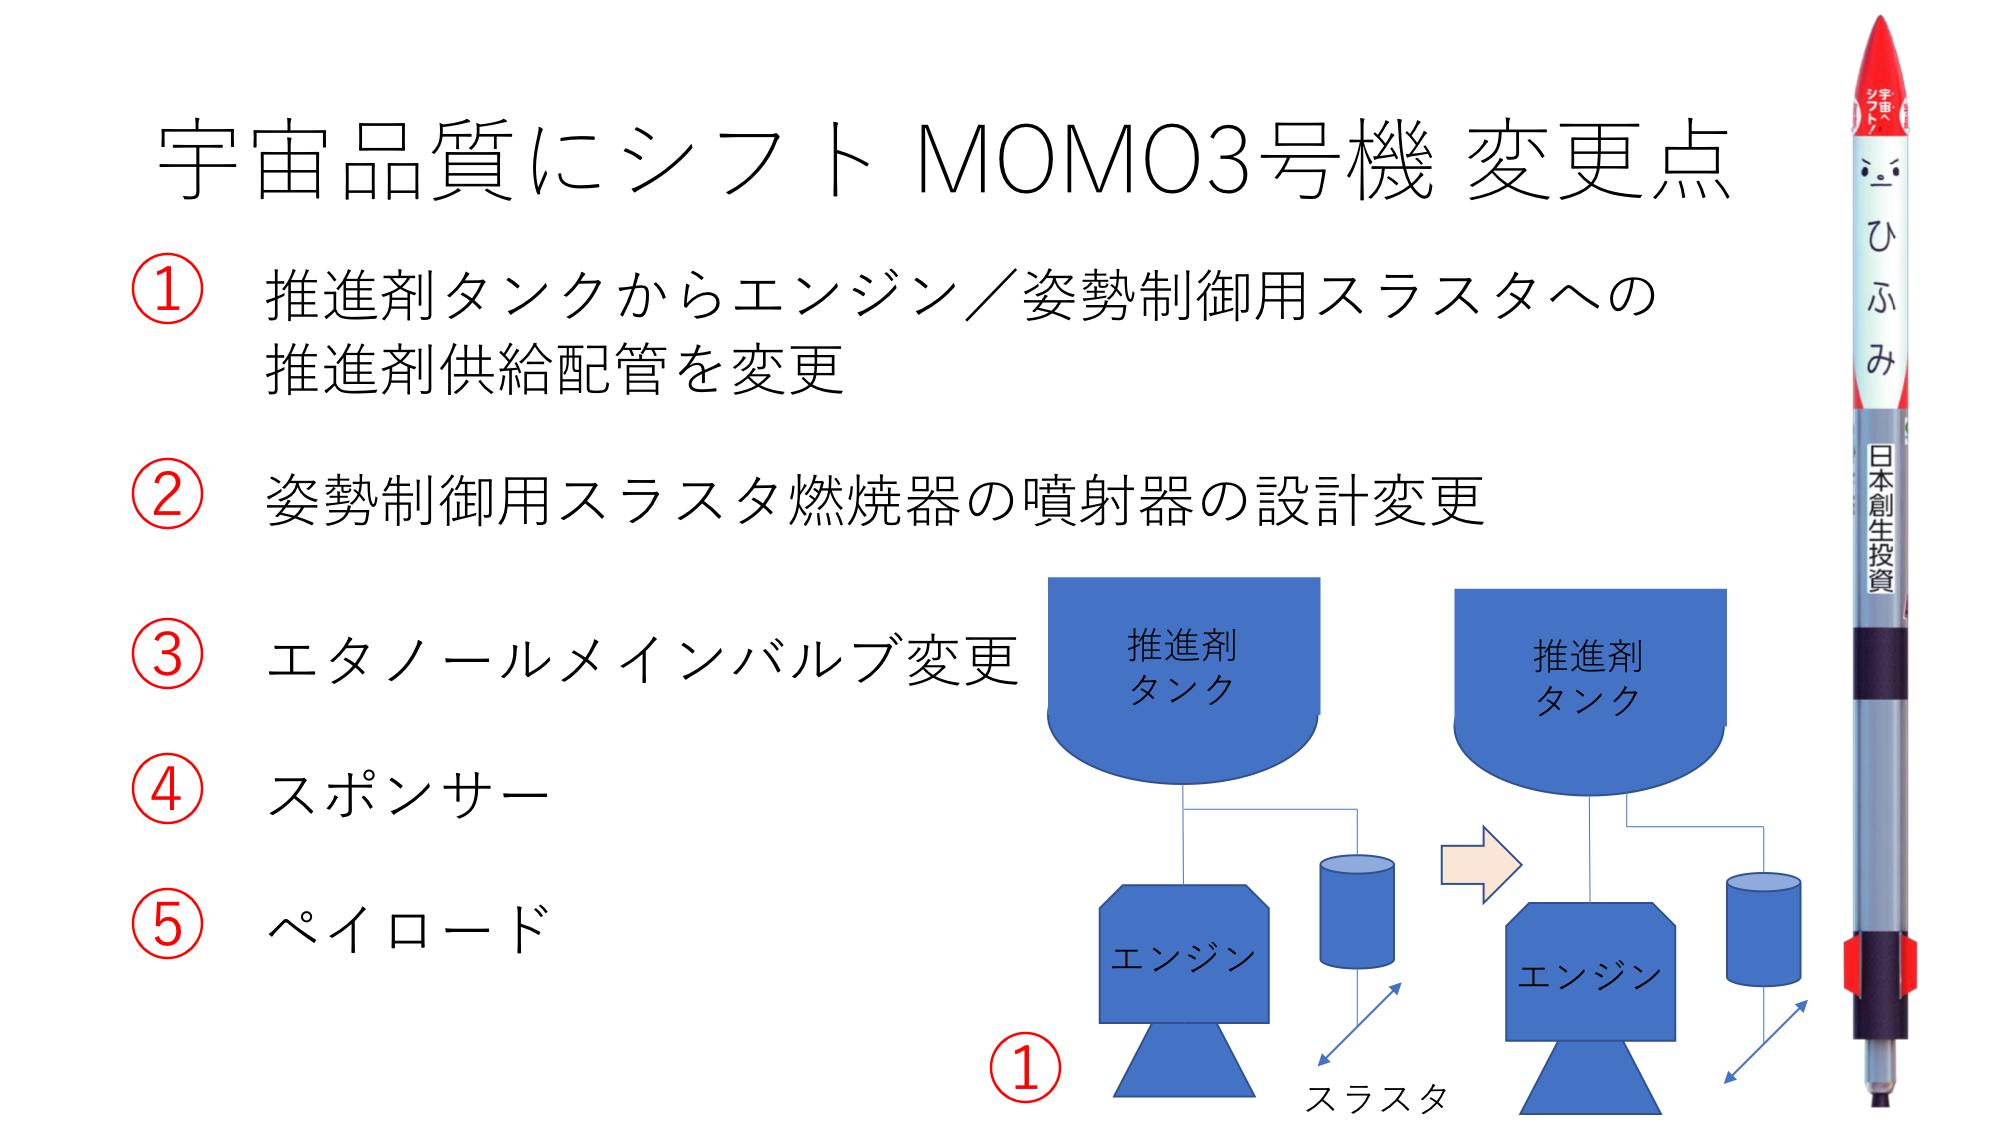 f:id:Imamura:20190414213958p:plain